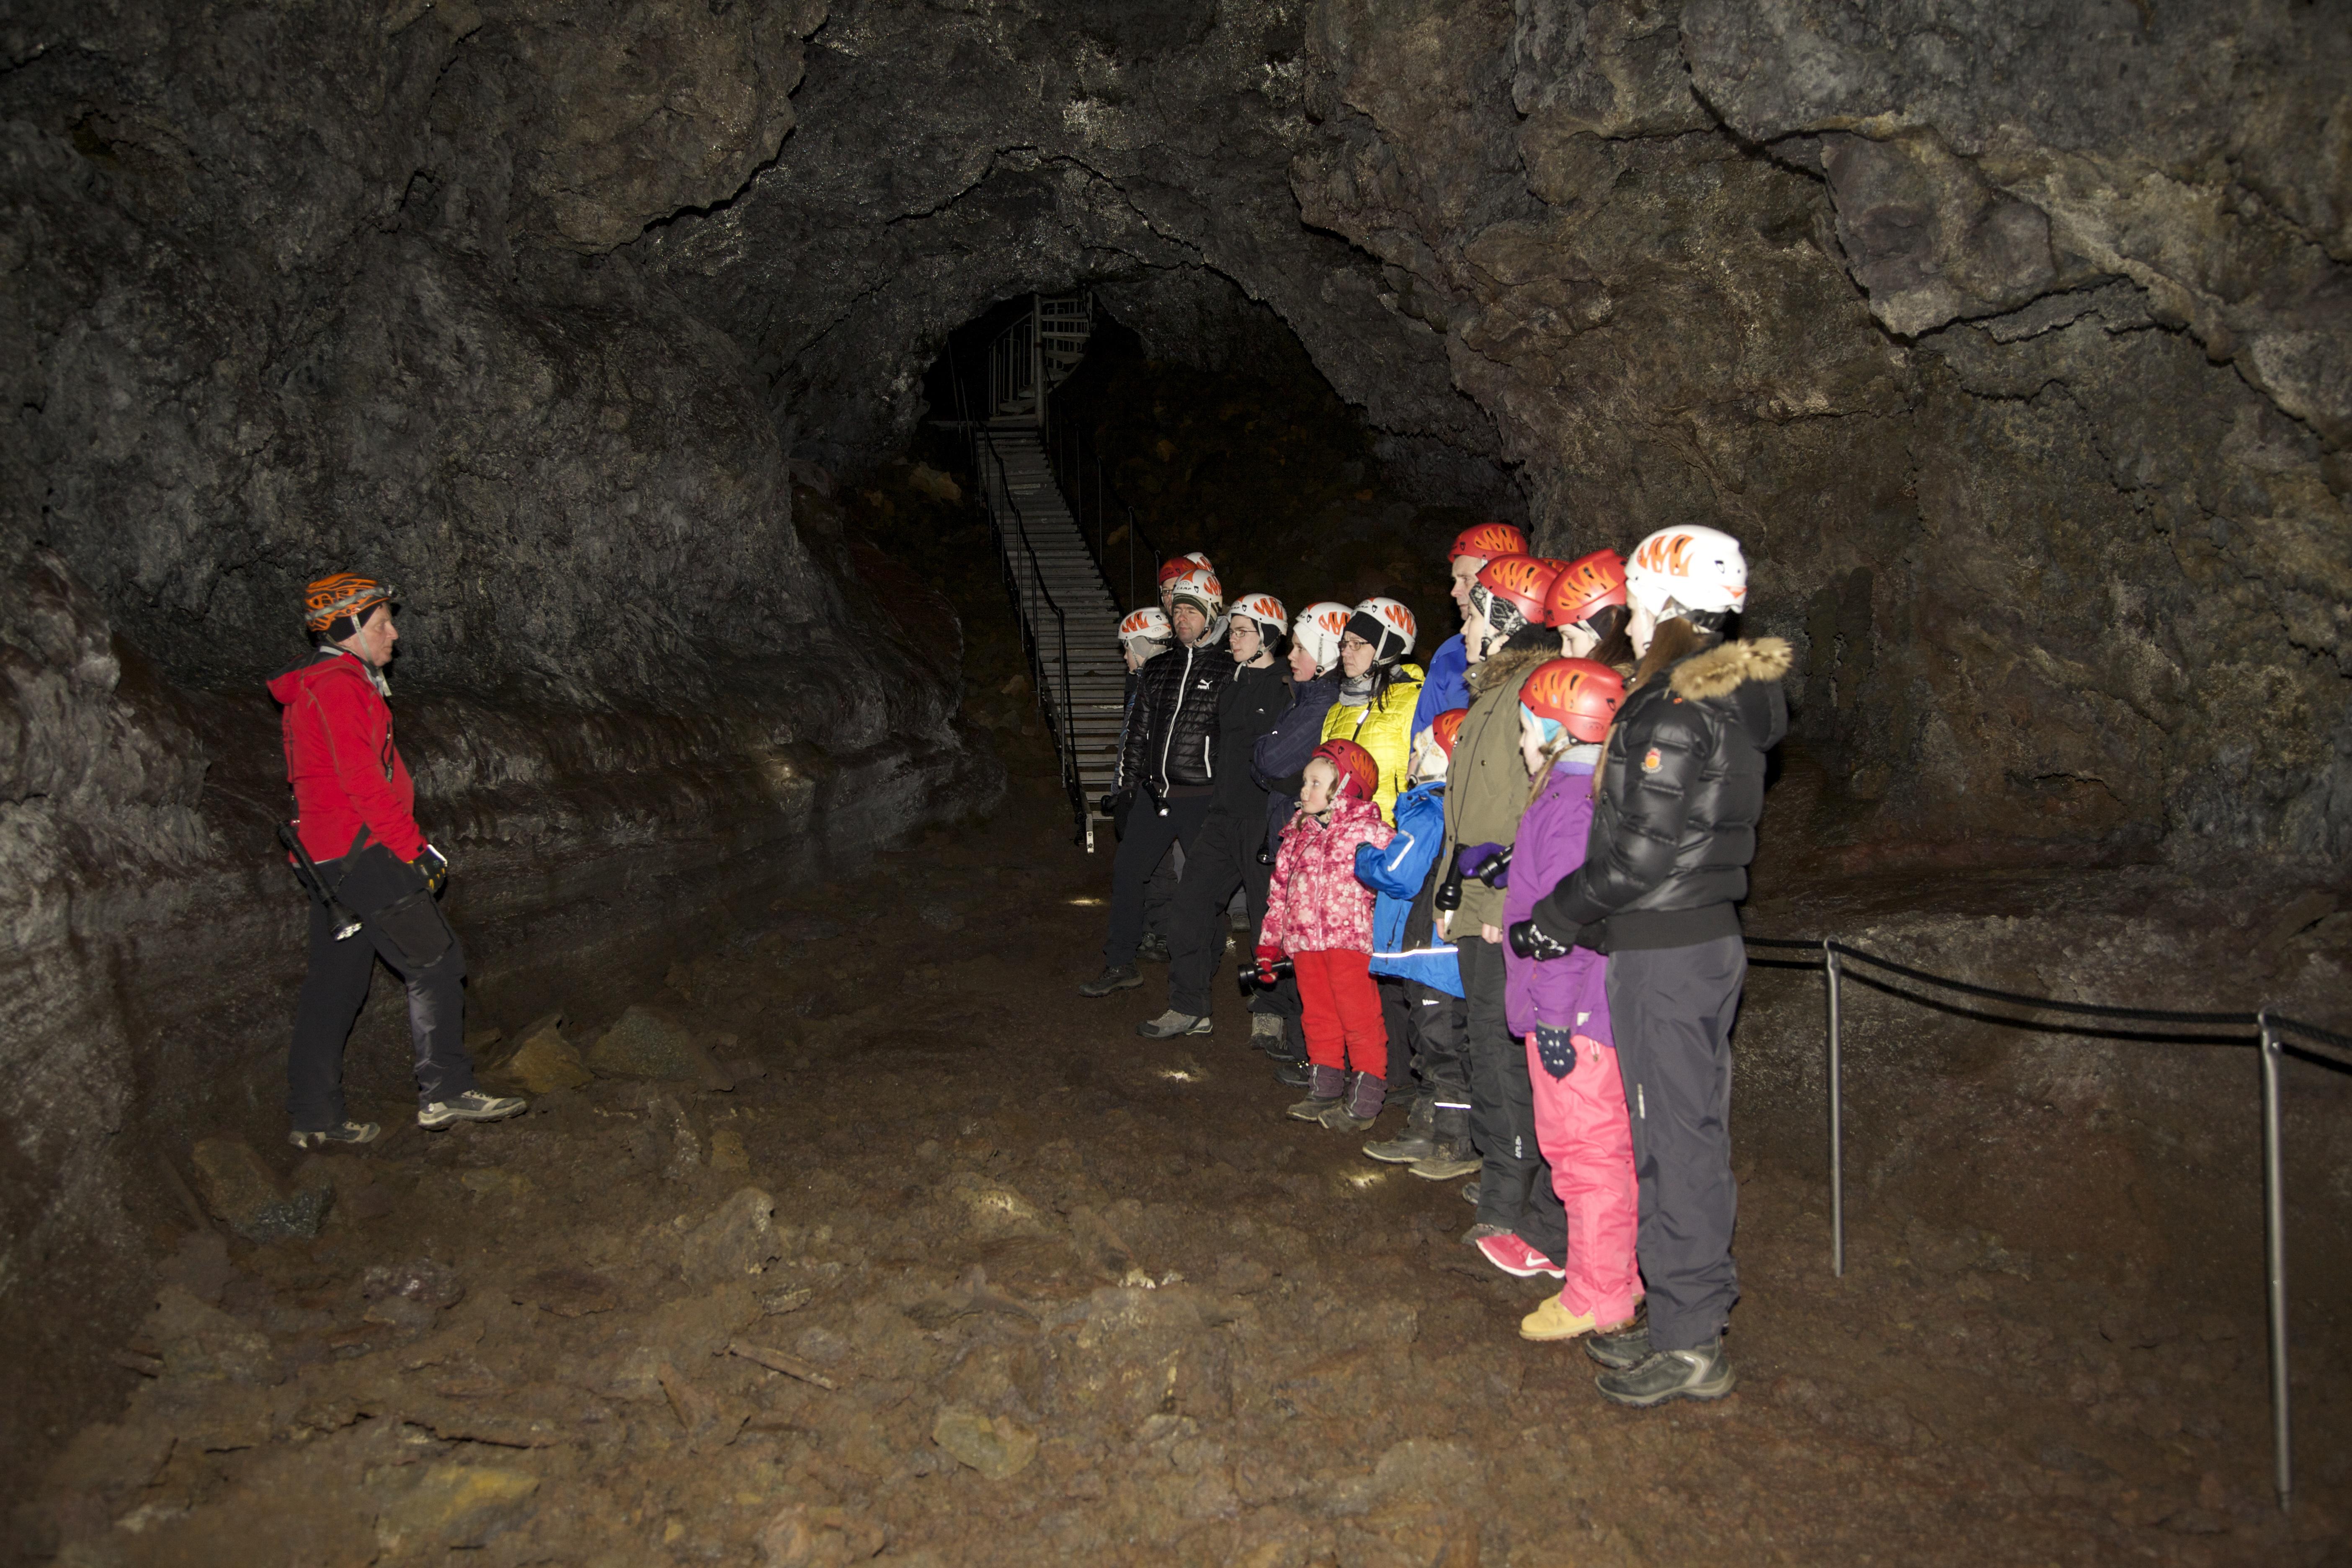 Vatnshellir er en 8000 år gammel lavahule på den islandske halvøya Snæfellsnes.